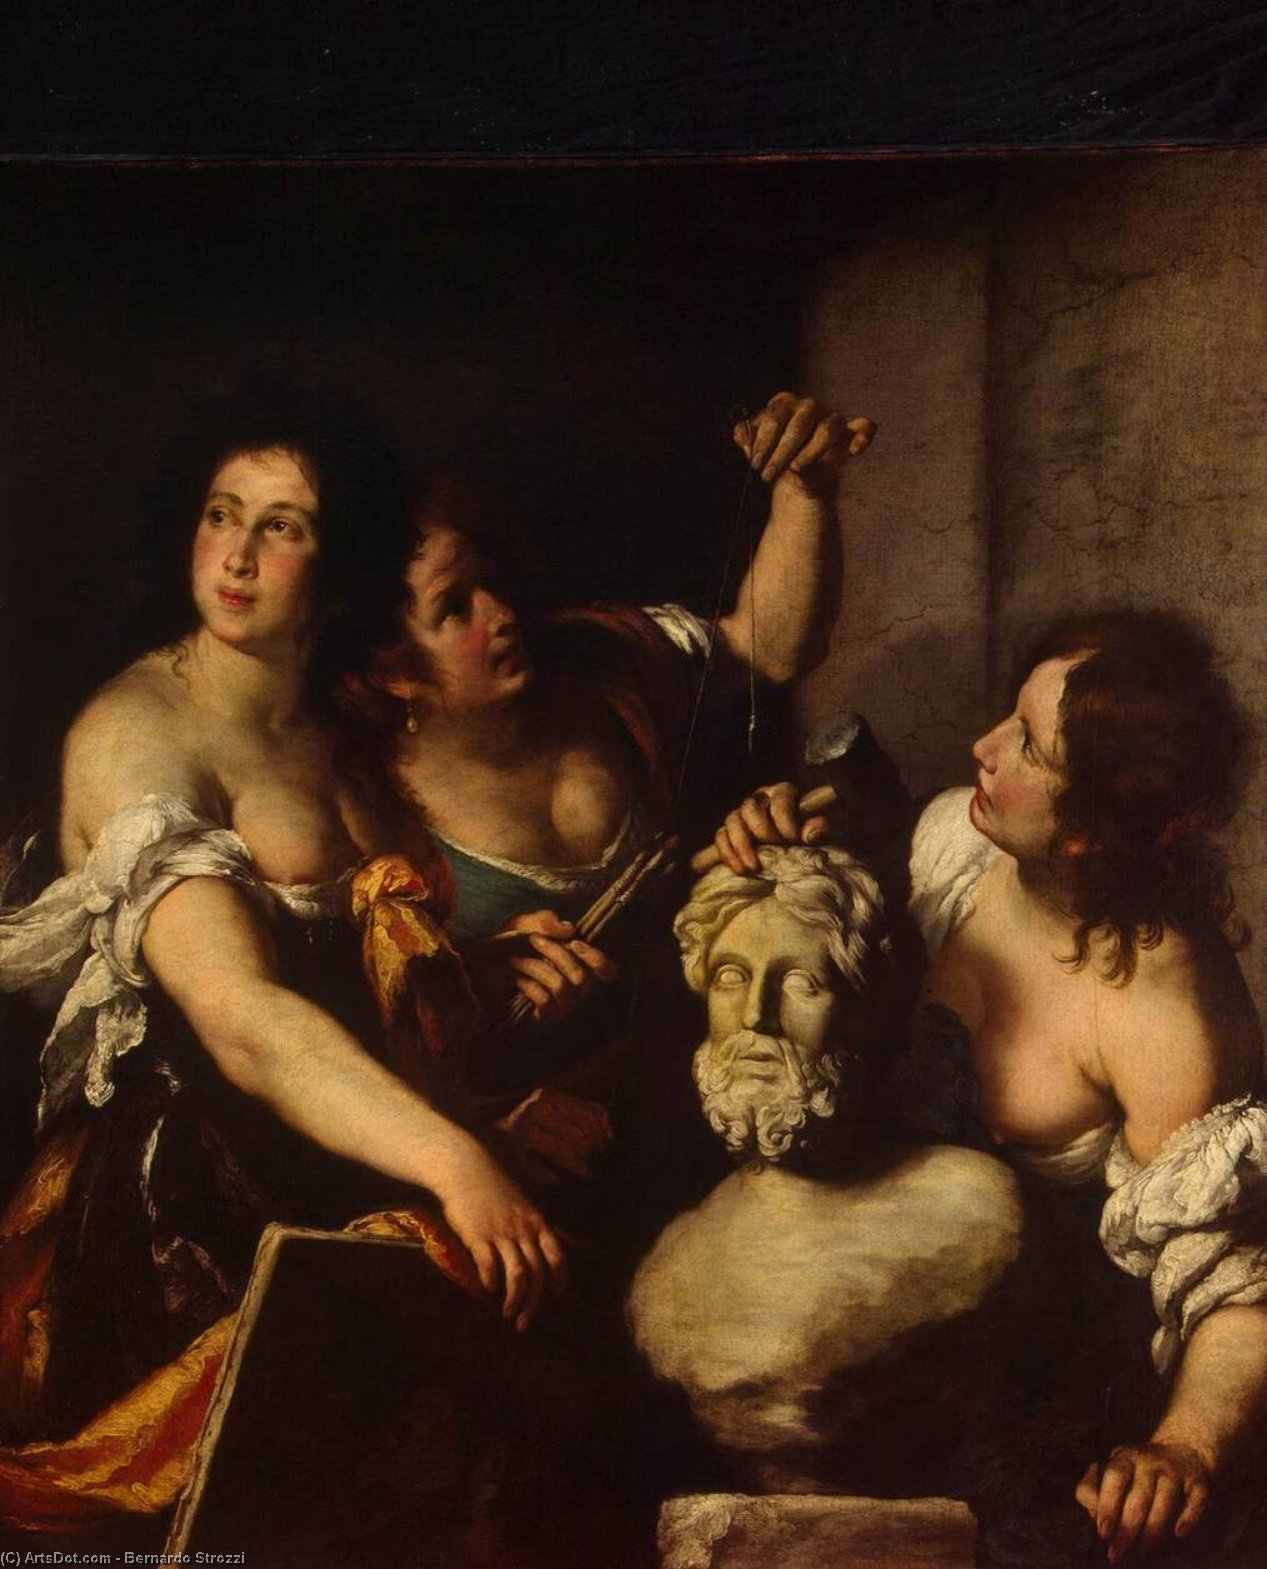 Wikioo.org - The Encyclopedia of Fine Arts - Painting, Artwork by Bernardo Strozzi - Allegory of Arts